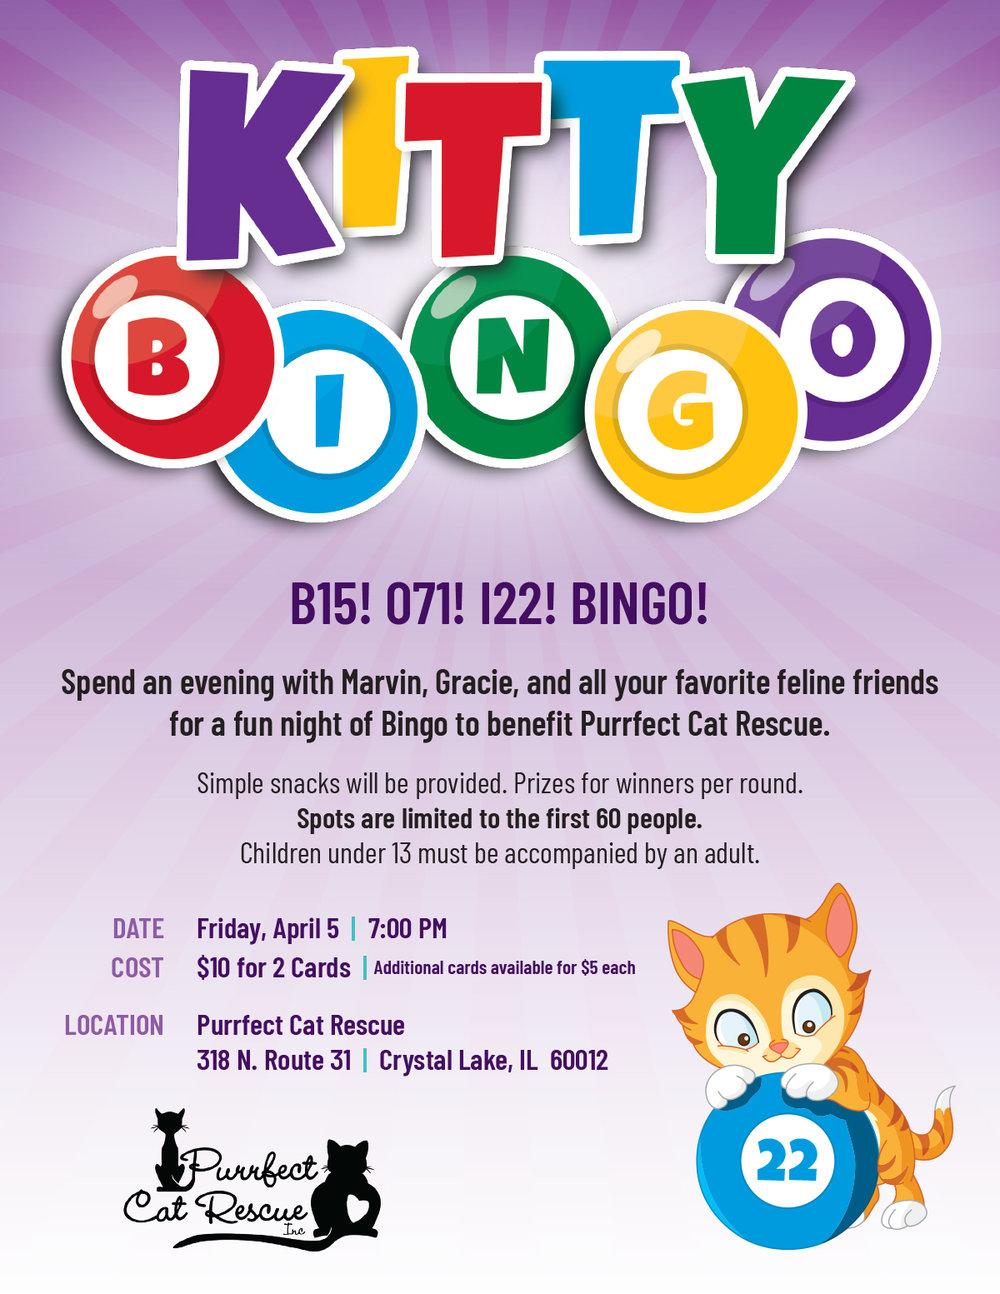 kitty_bingo_flyer_040519_1200x1553.jpg